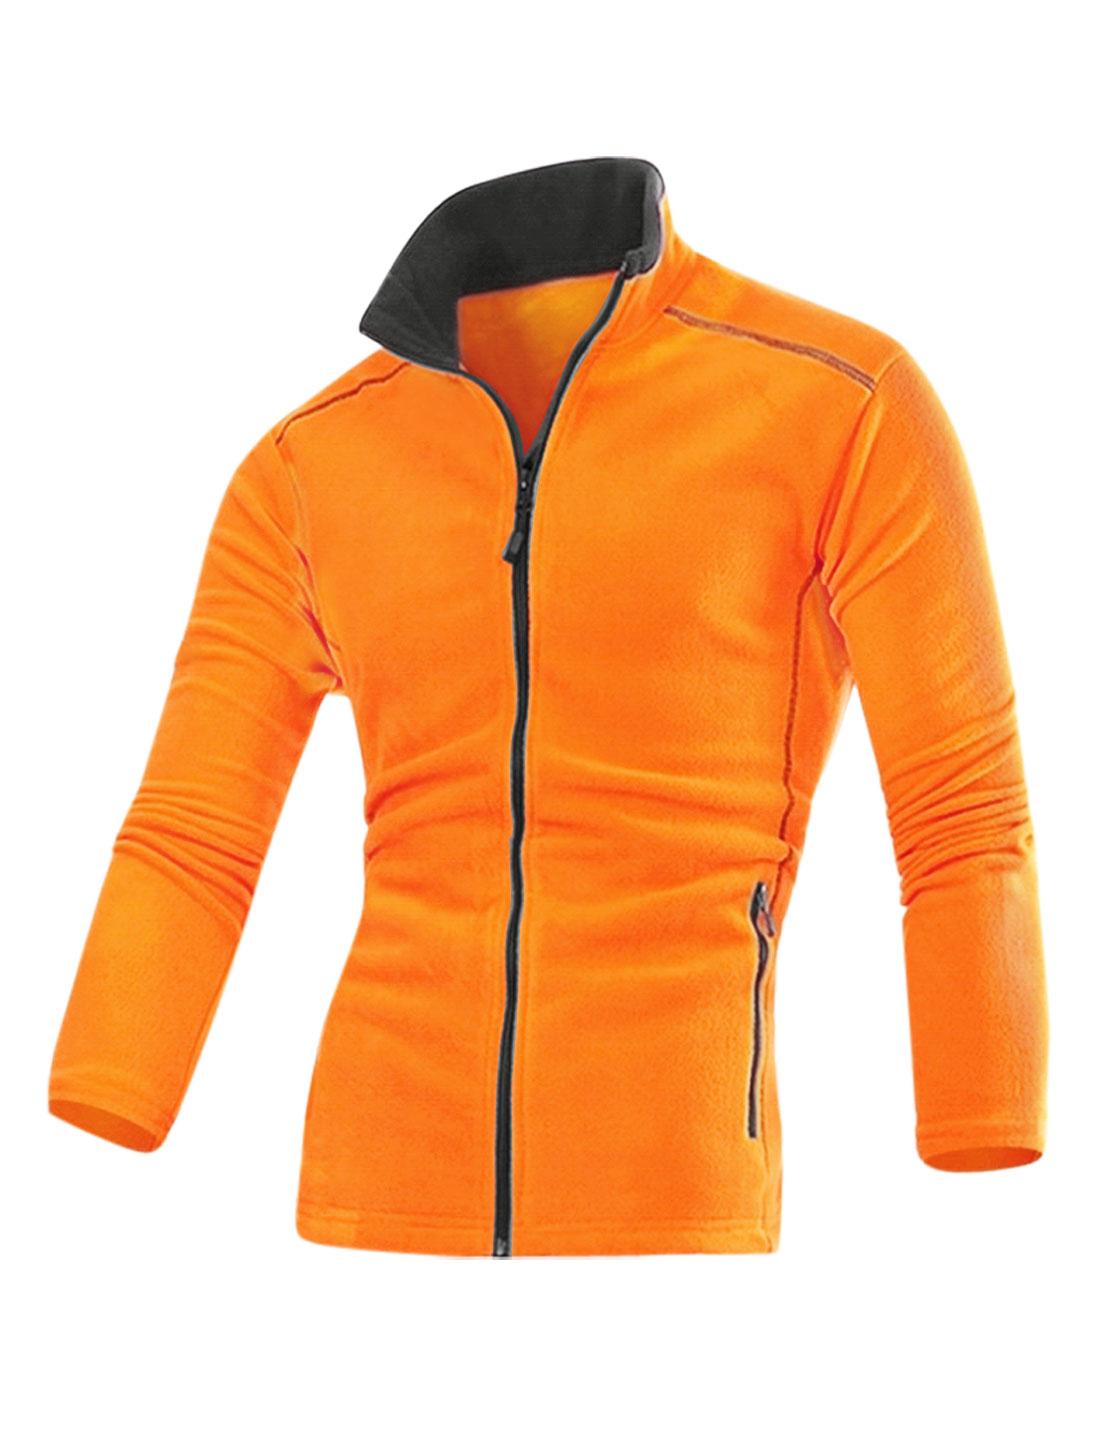 Men Long Sleeves Zip Up Stand Collar Slant Pockets Fleece Jacket Orange M